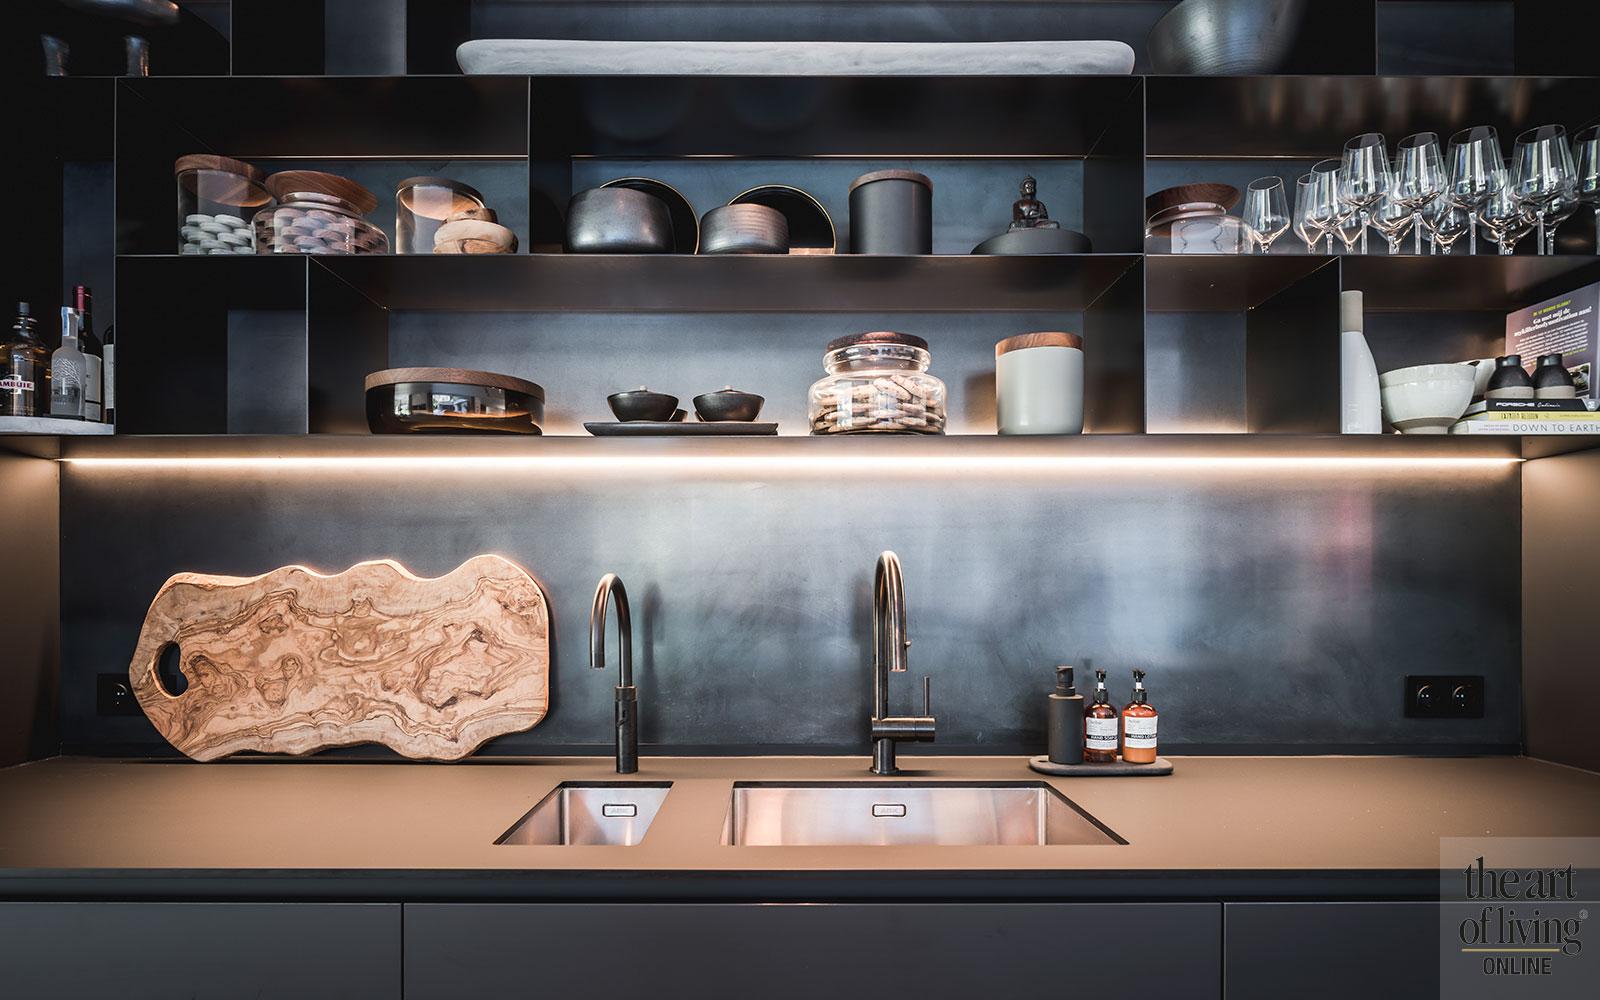 High End Kitchens, Culimaat, maatwerk keukens, zwart wit keuken